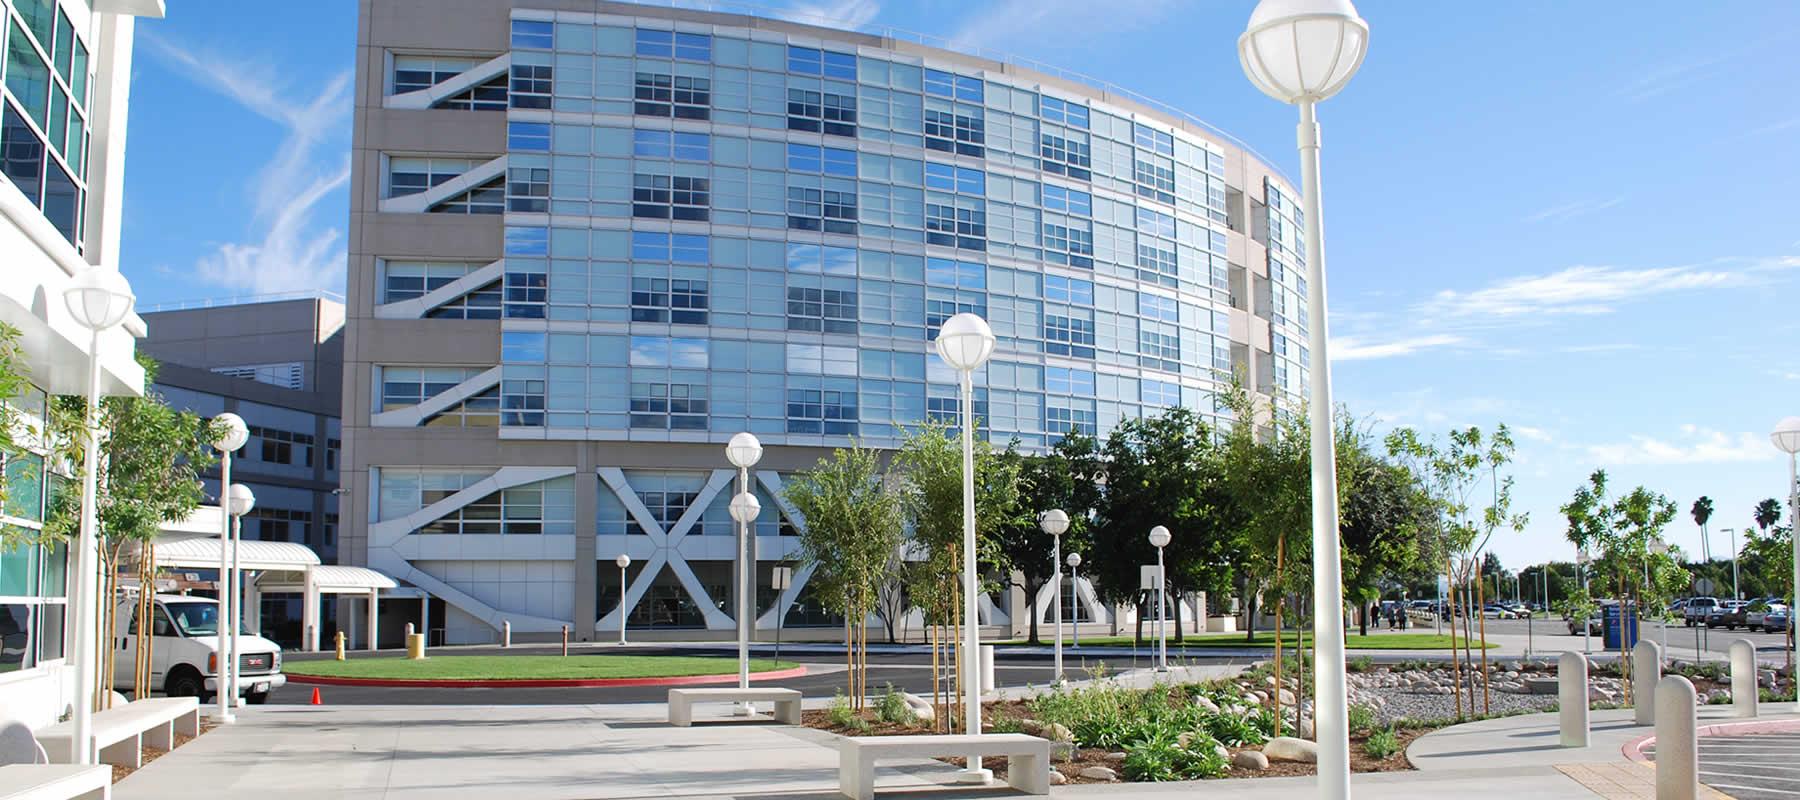 Arrowhead Regional Medical Center Family Medicine Residency